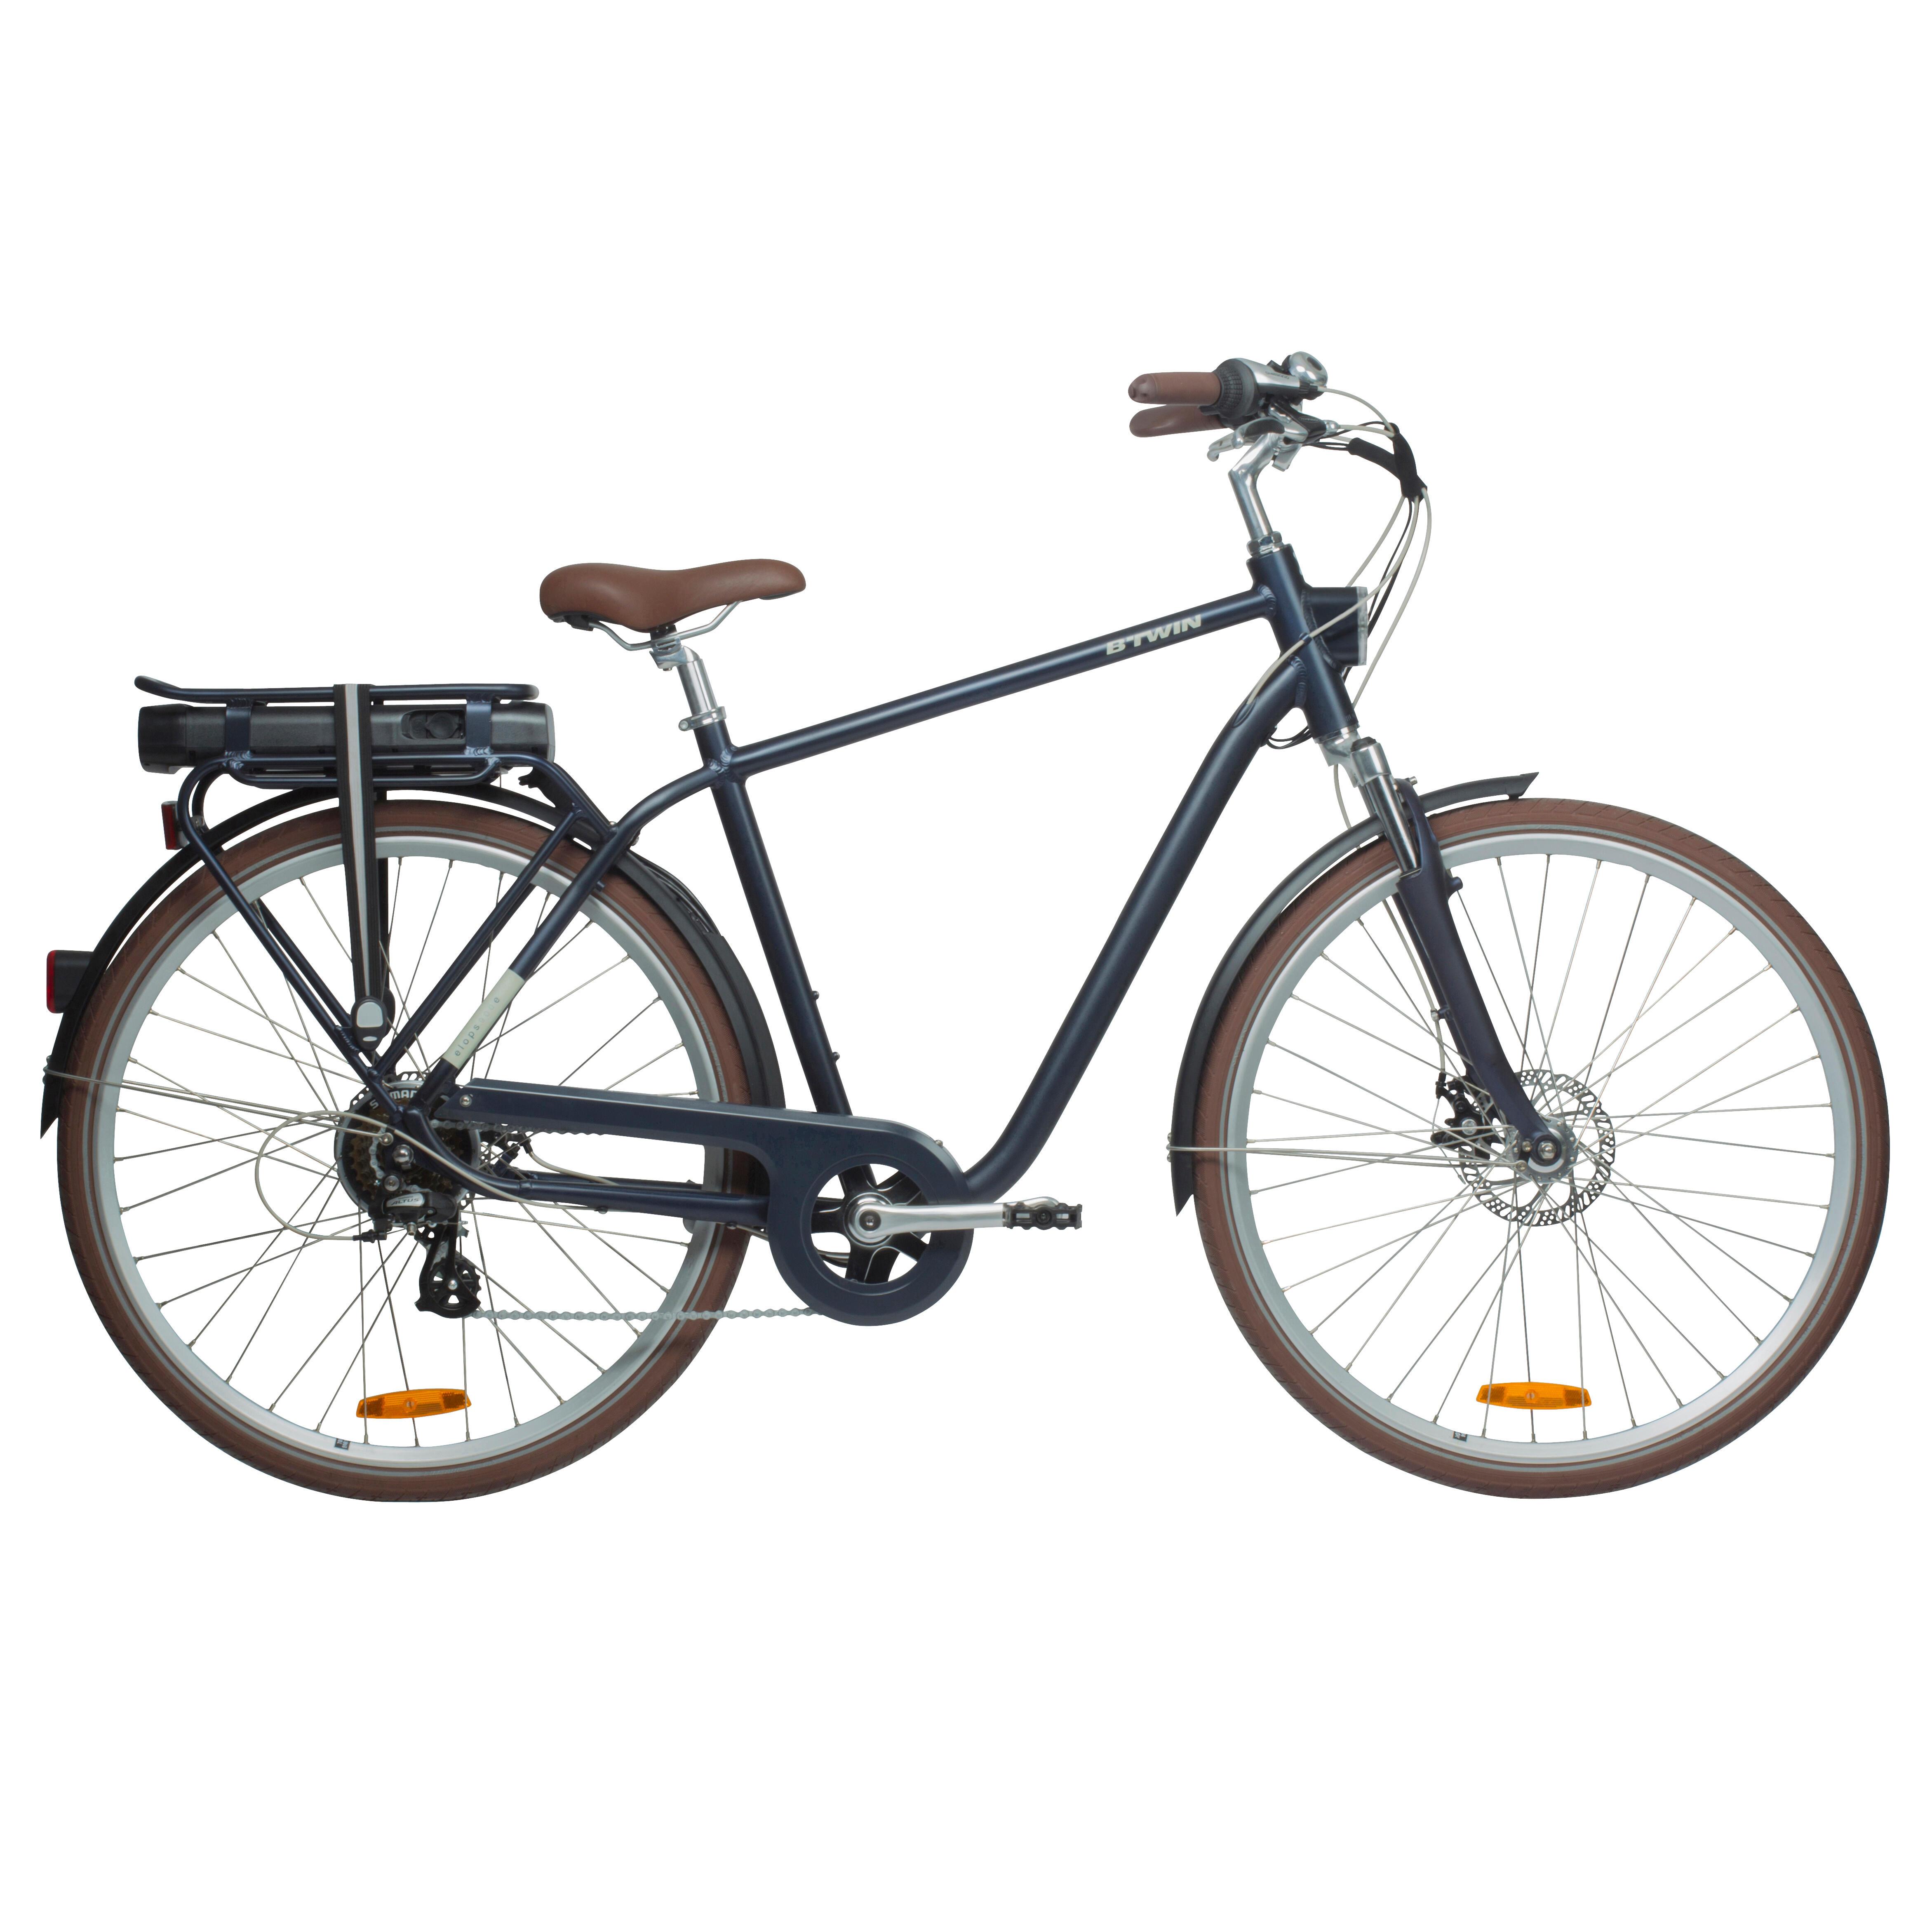 b 39 twin elektrische fiets elops 900 e hoog frame decathlon. Black Bedroom Furniture Sets. Home Design Ideas